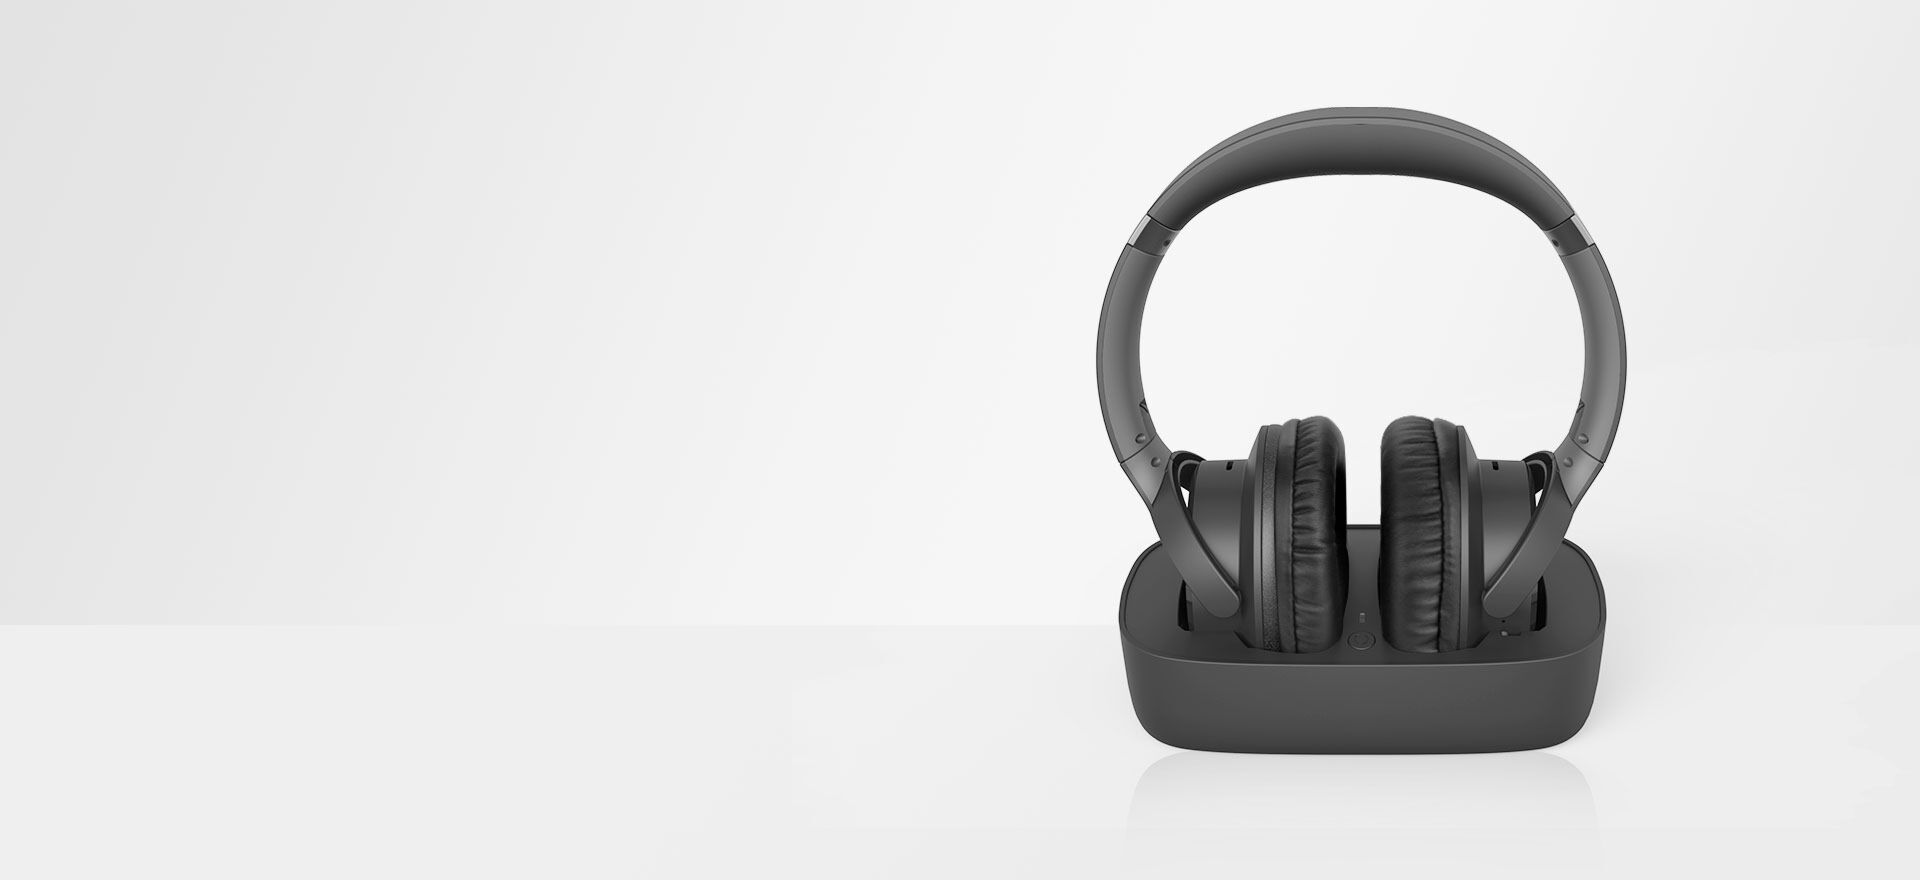 Bt5 0 Bluetooth Headphone For Tv Watching Avantree Ensemble